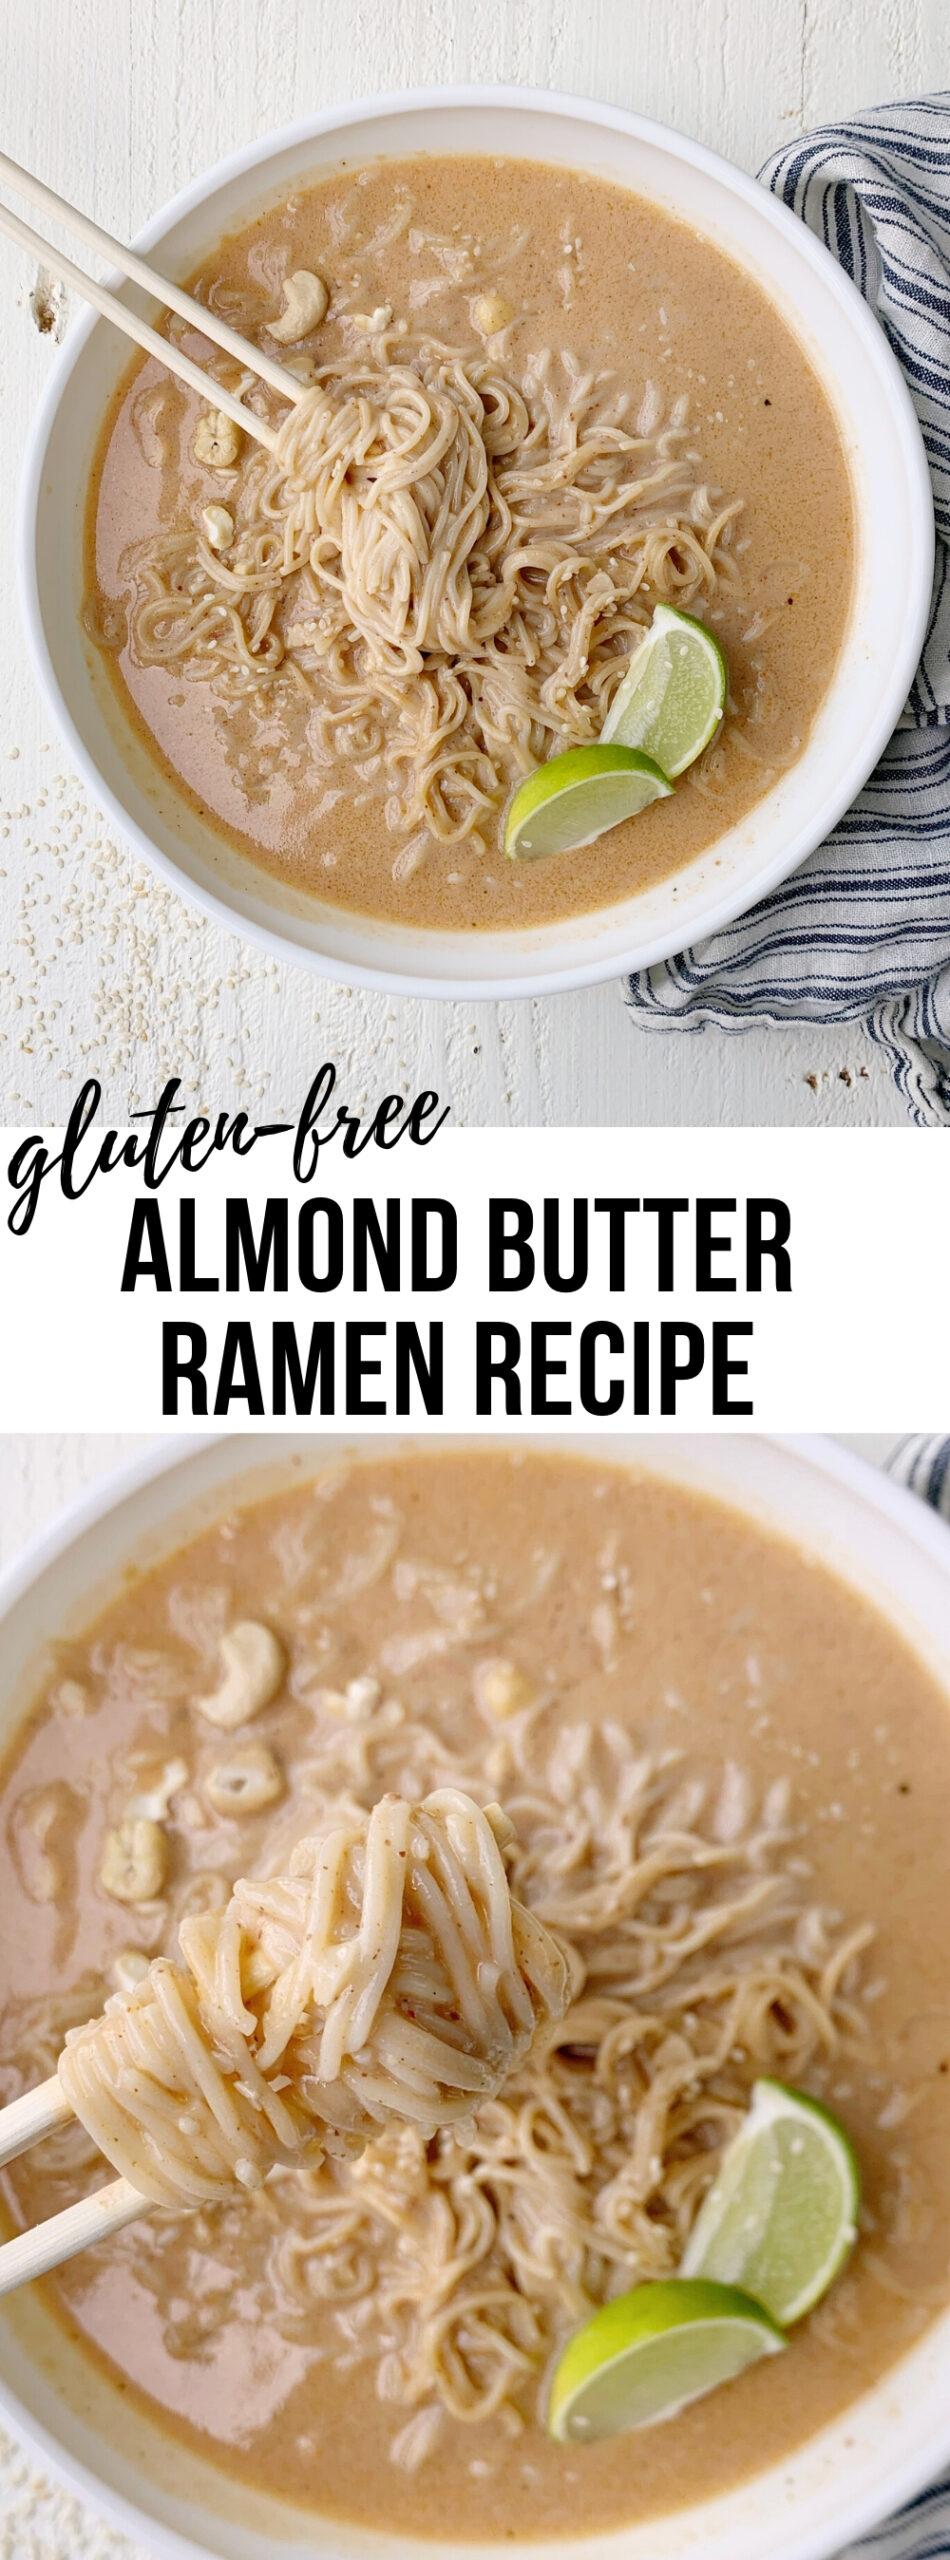 gluten free almond butter ramen recipe